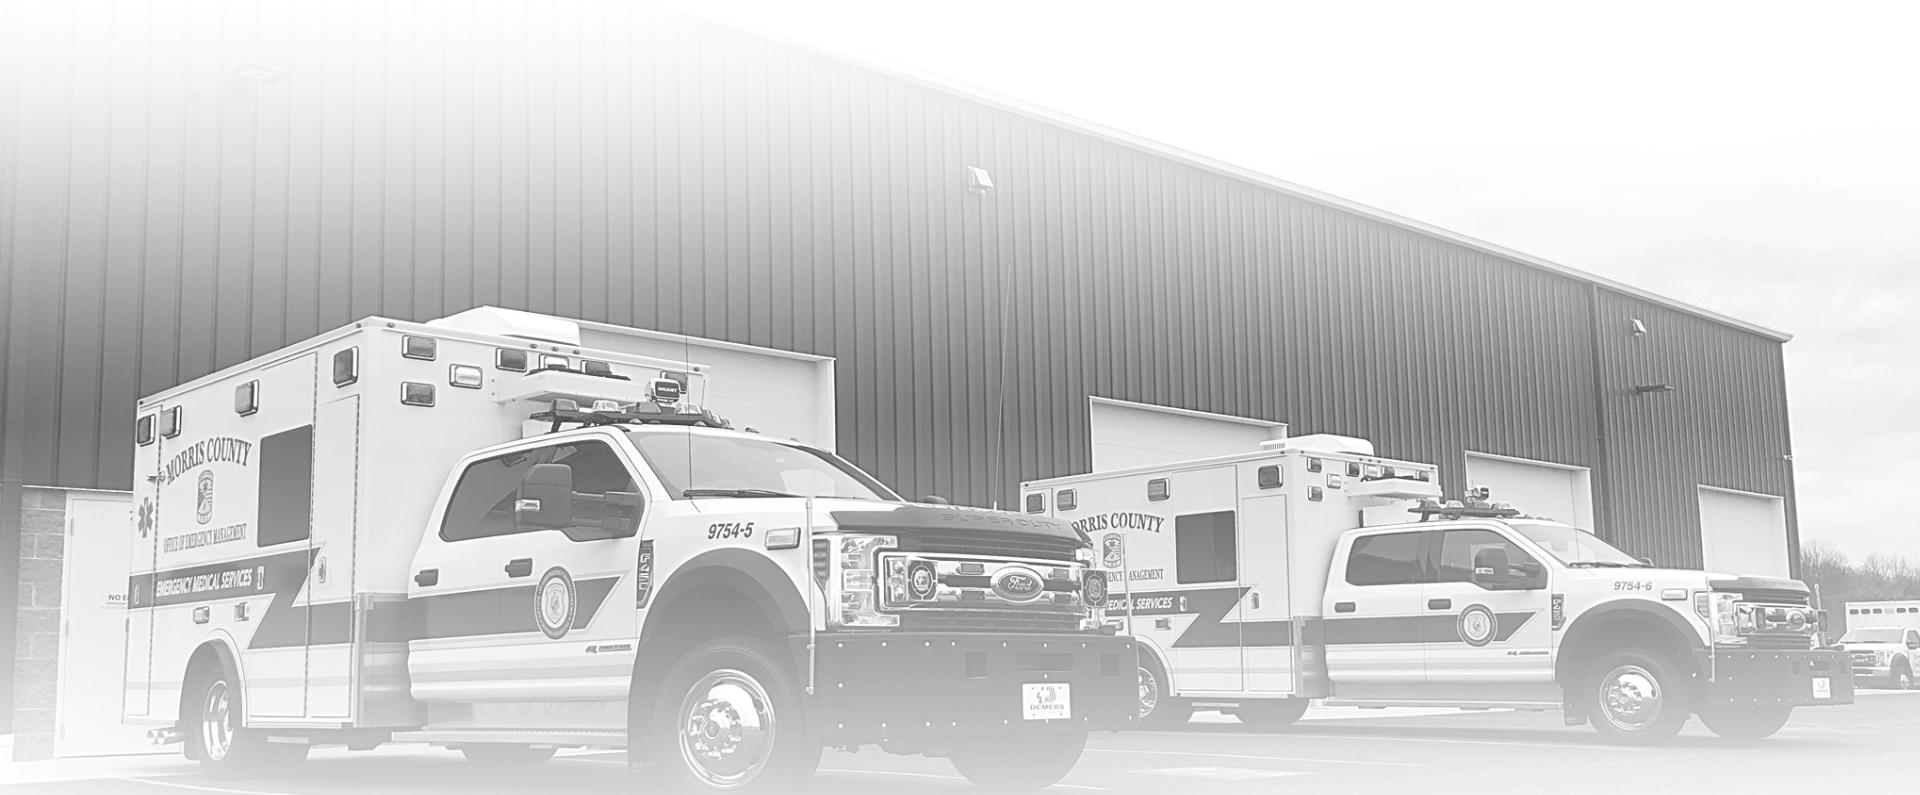 First Priority Emergency Vehicles Ambulance Service Servicing Ambulances Ambulance Filters Ambulance Help Ambulance New Jersey